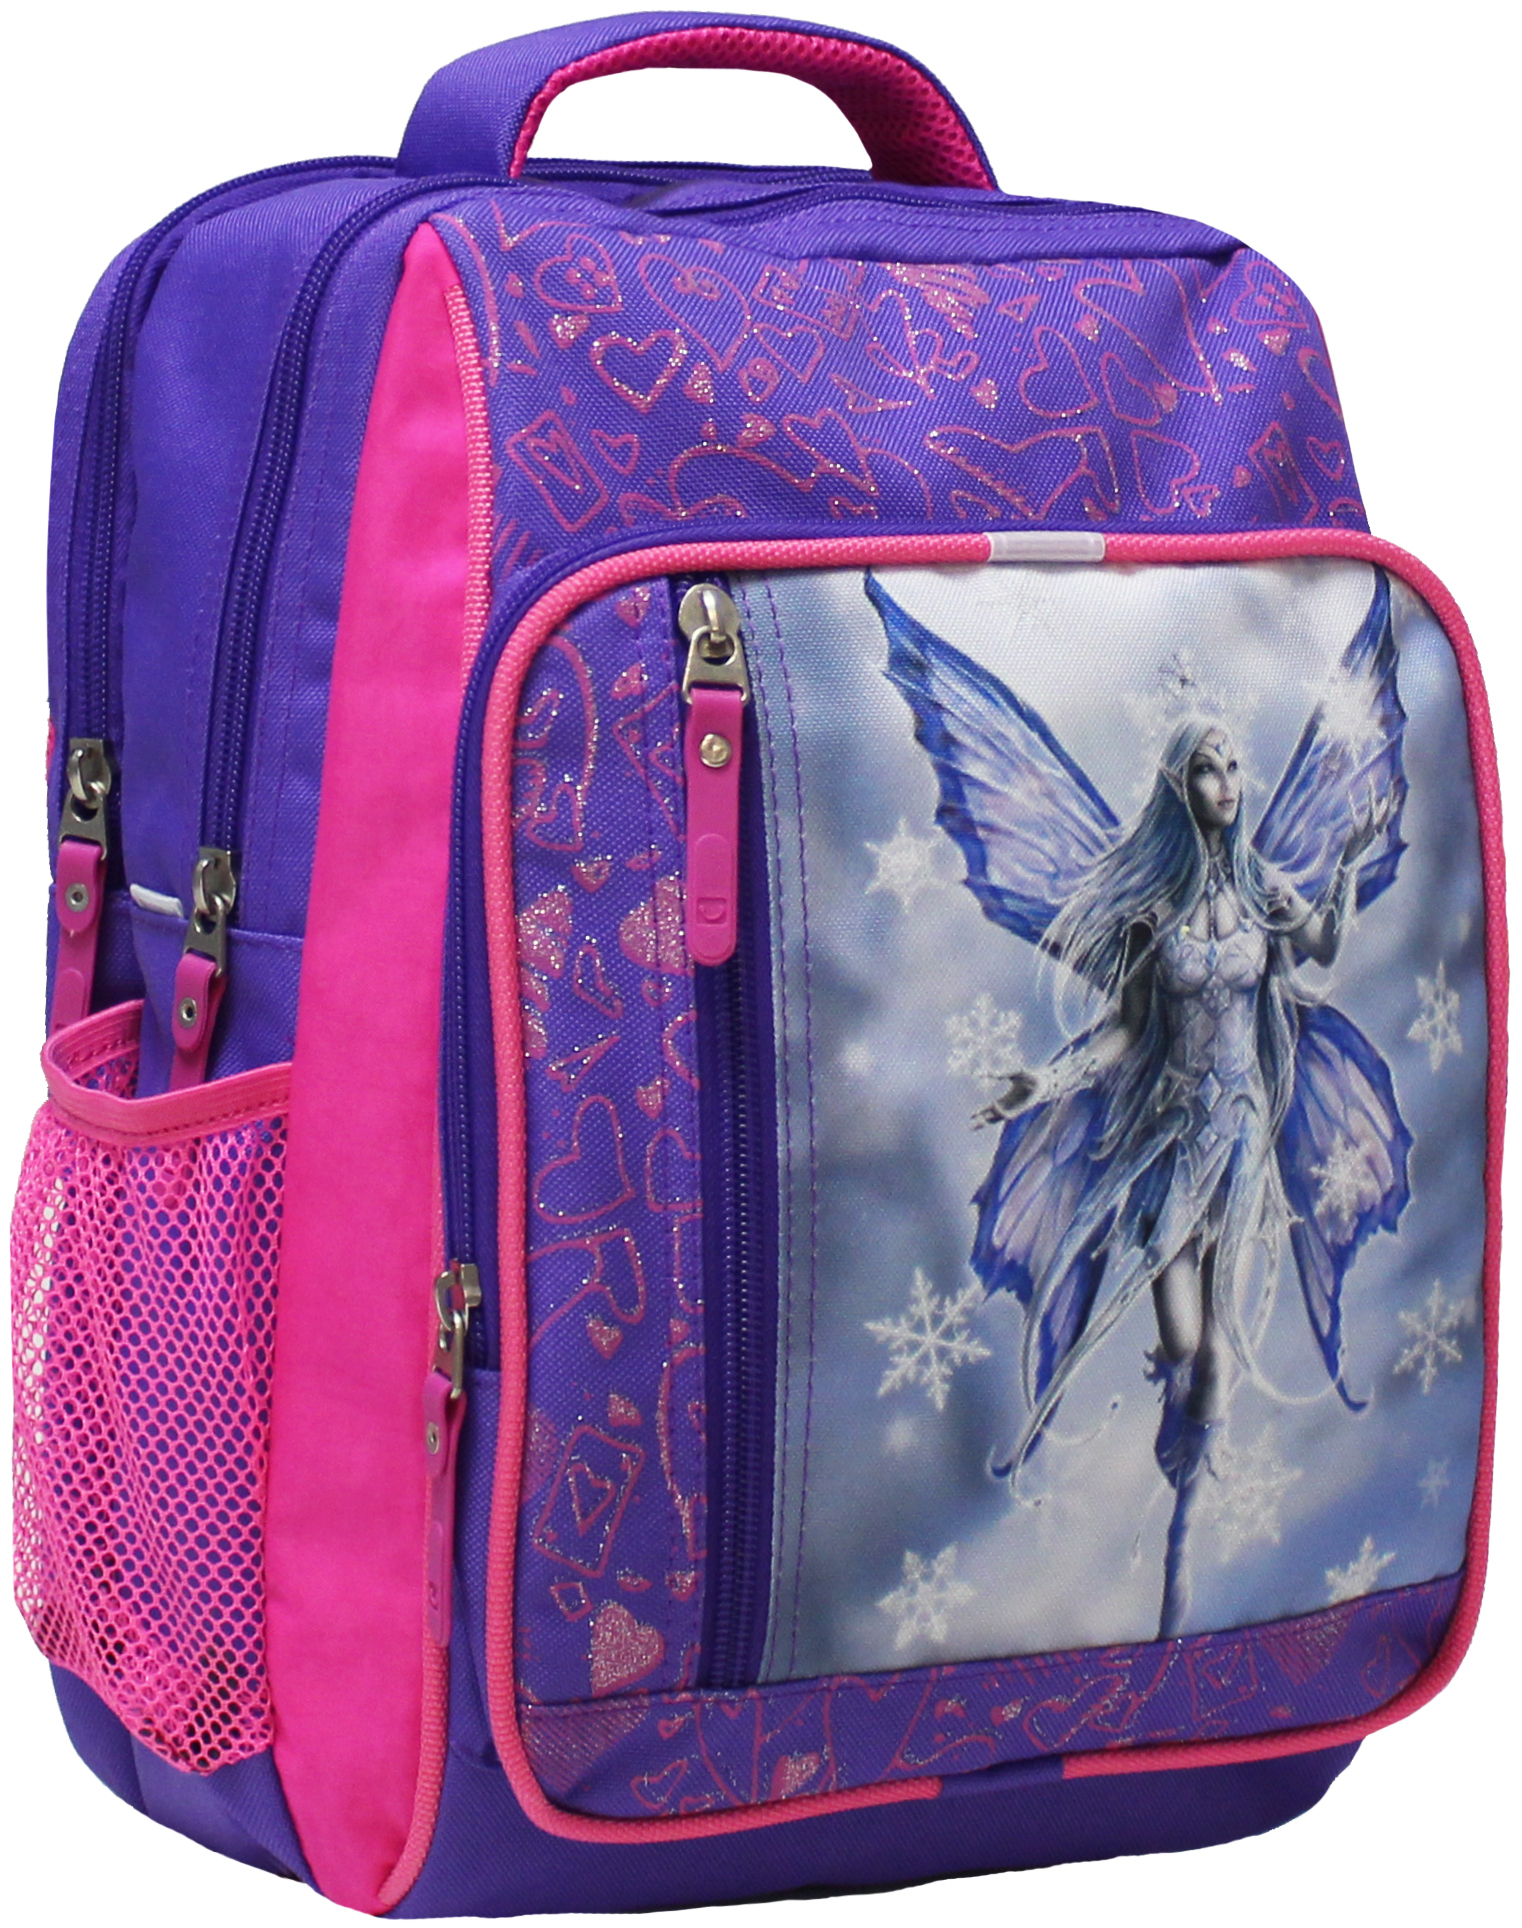 Школьные рюкзаки Рюкзак Bagland Школьник 8 л. 170 фіолетовий 94 д (00112662) IMG_5156.JPG